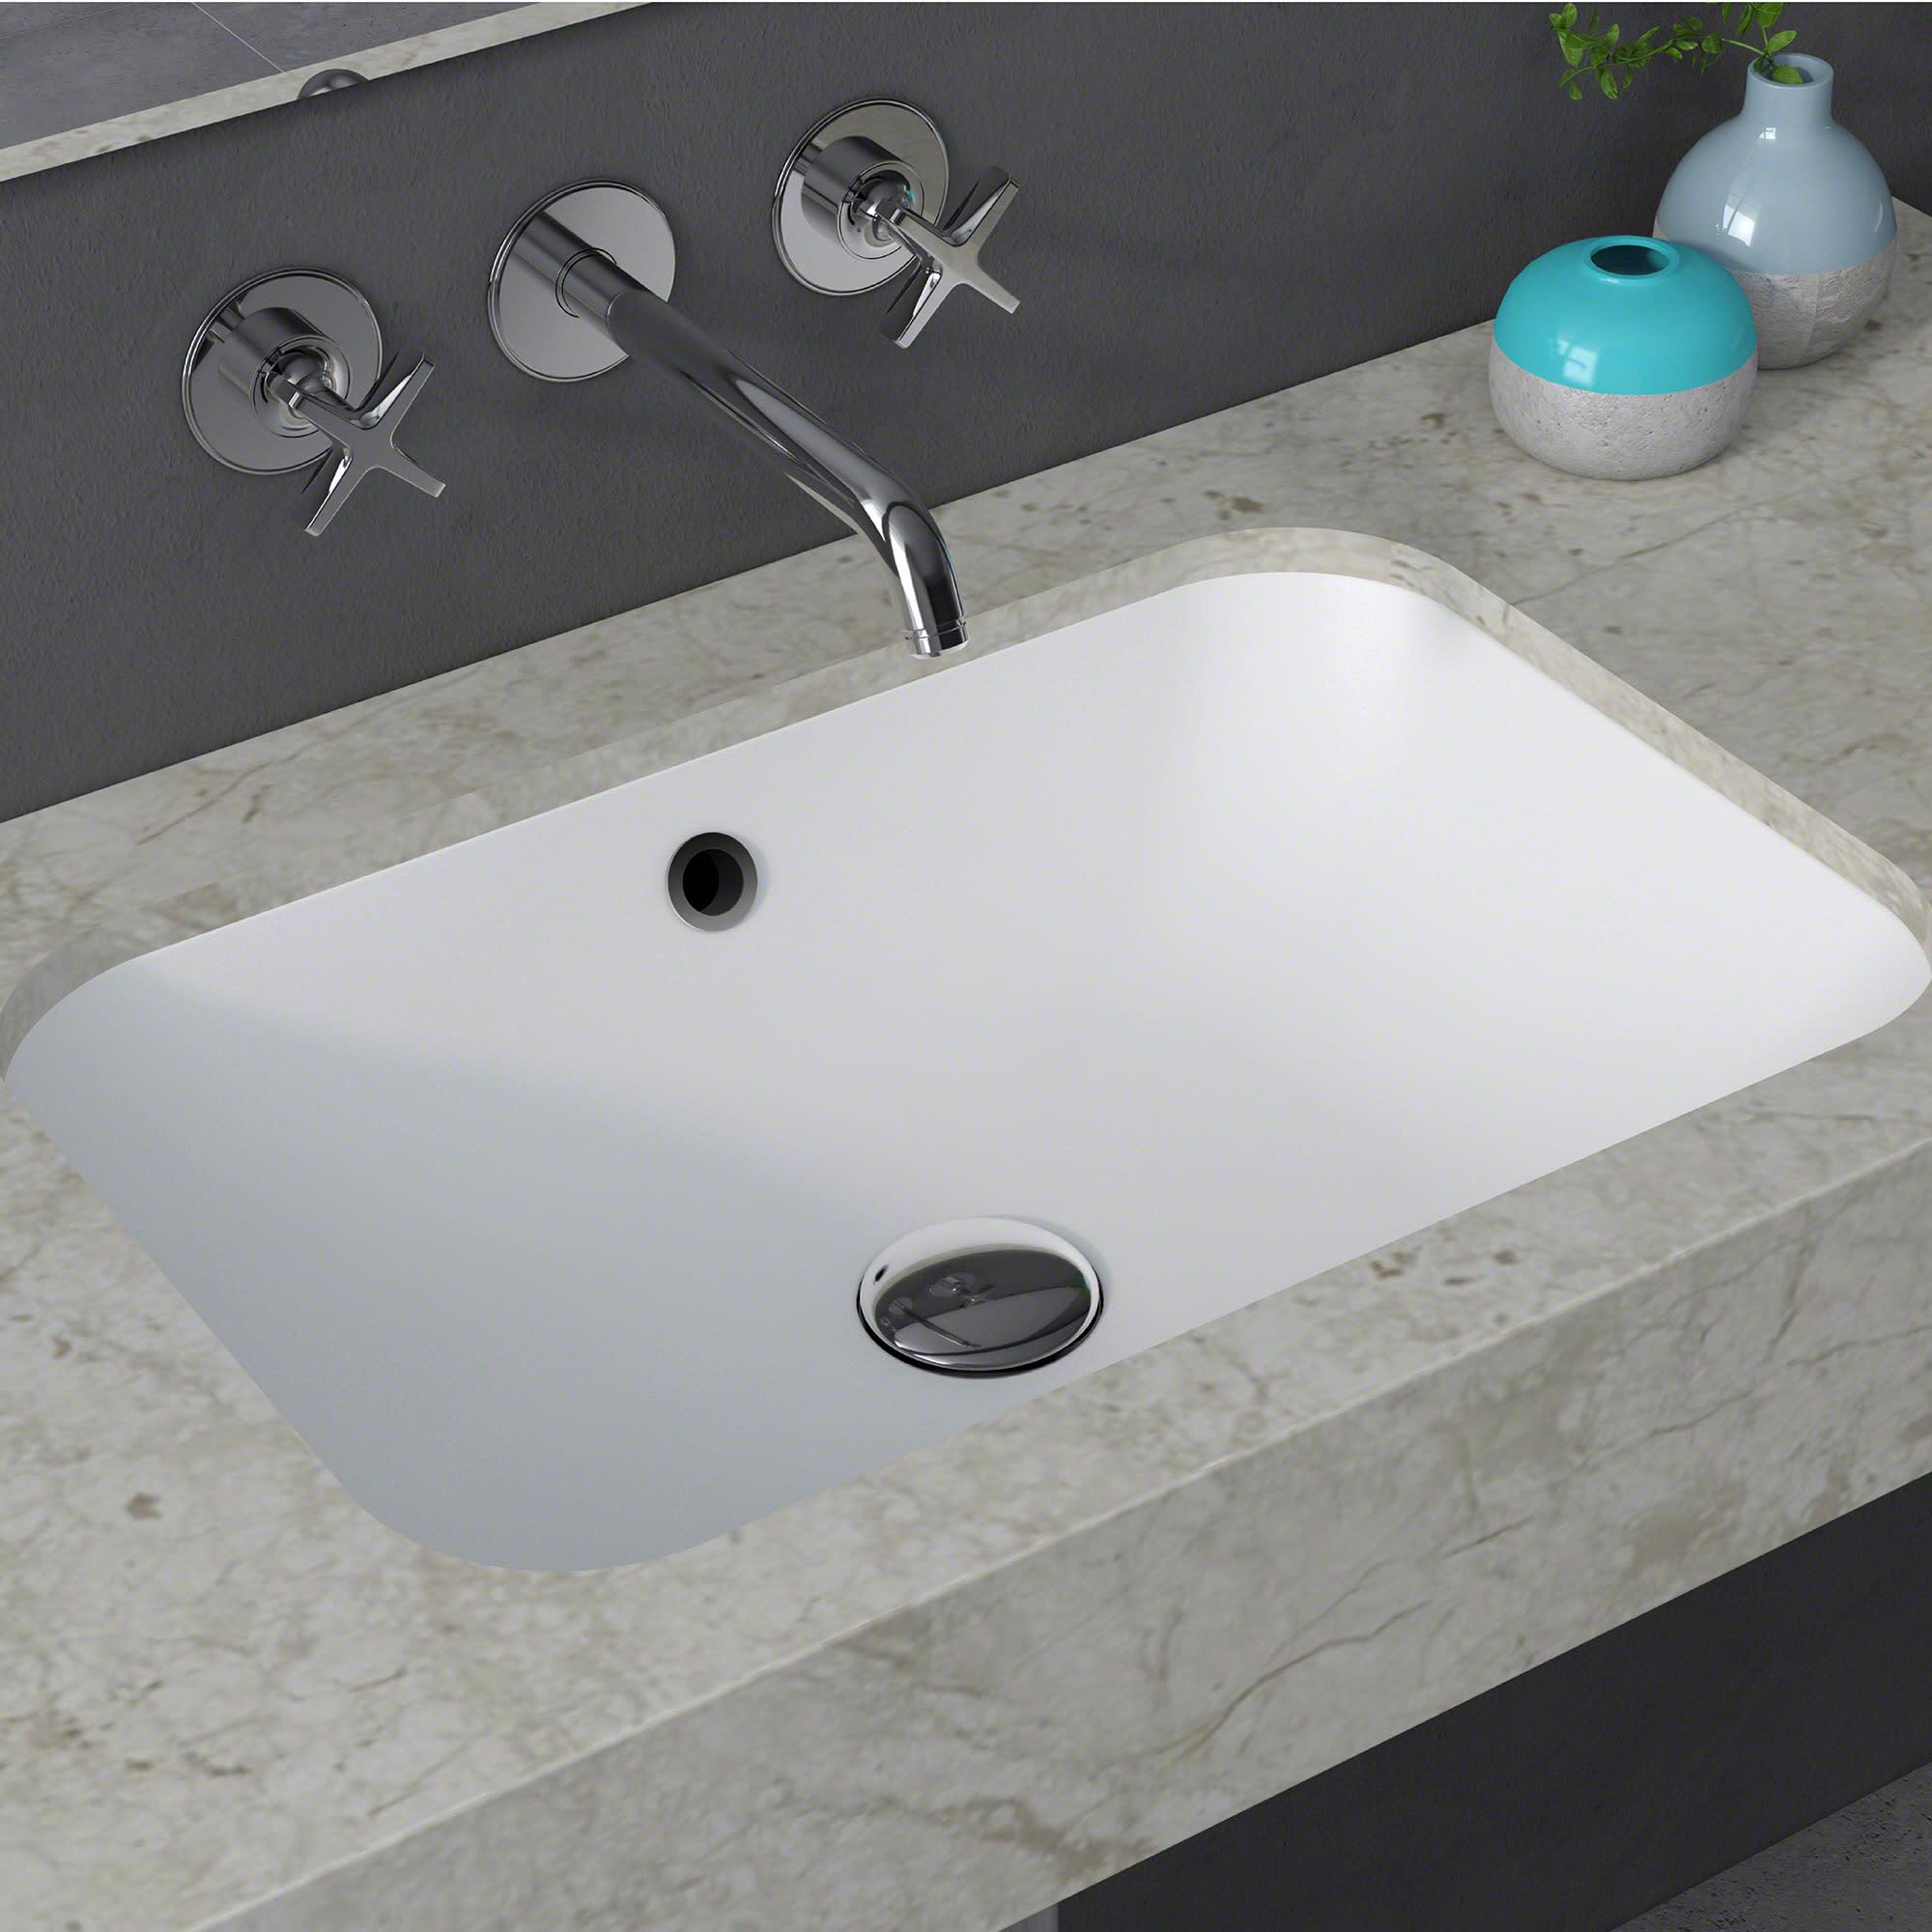 amazing marble countertop sink design and modern faucet.htm kraus ksu 8mw natura rectangle undermount composite bathroom sink  kraus ksu 8mw natura rectangle